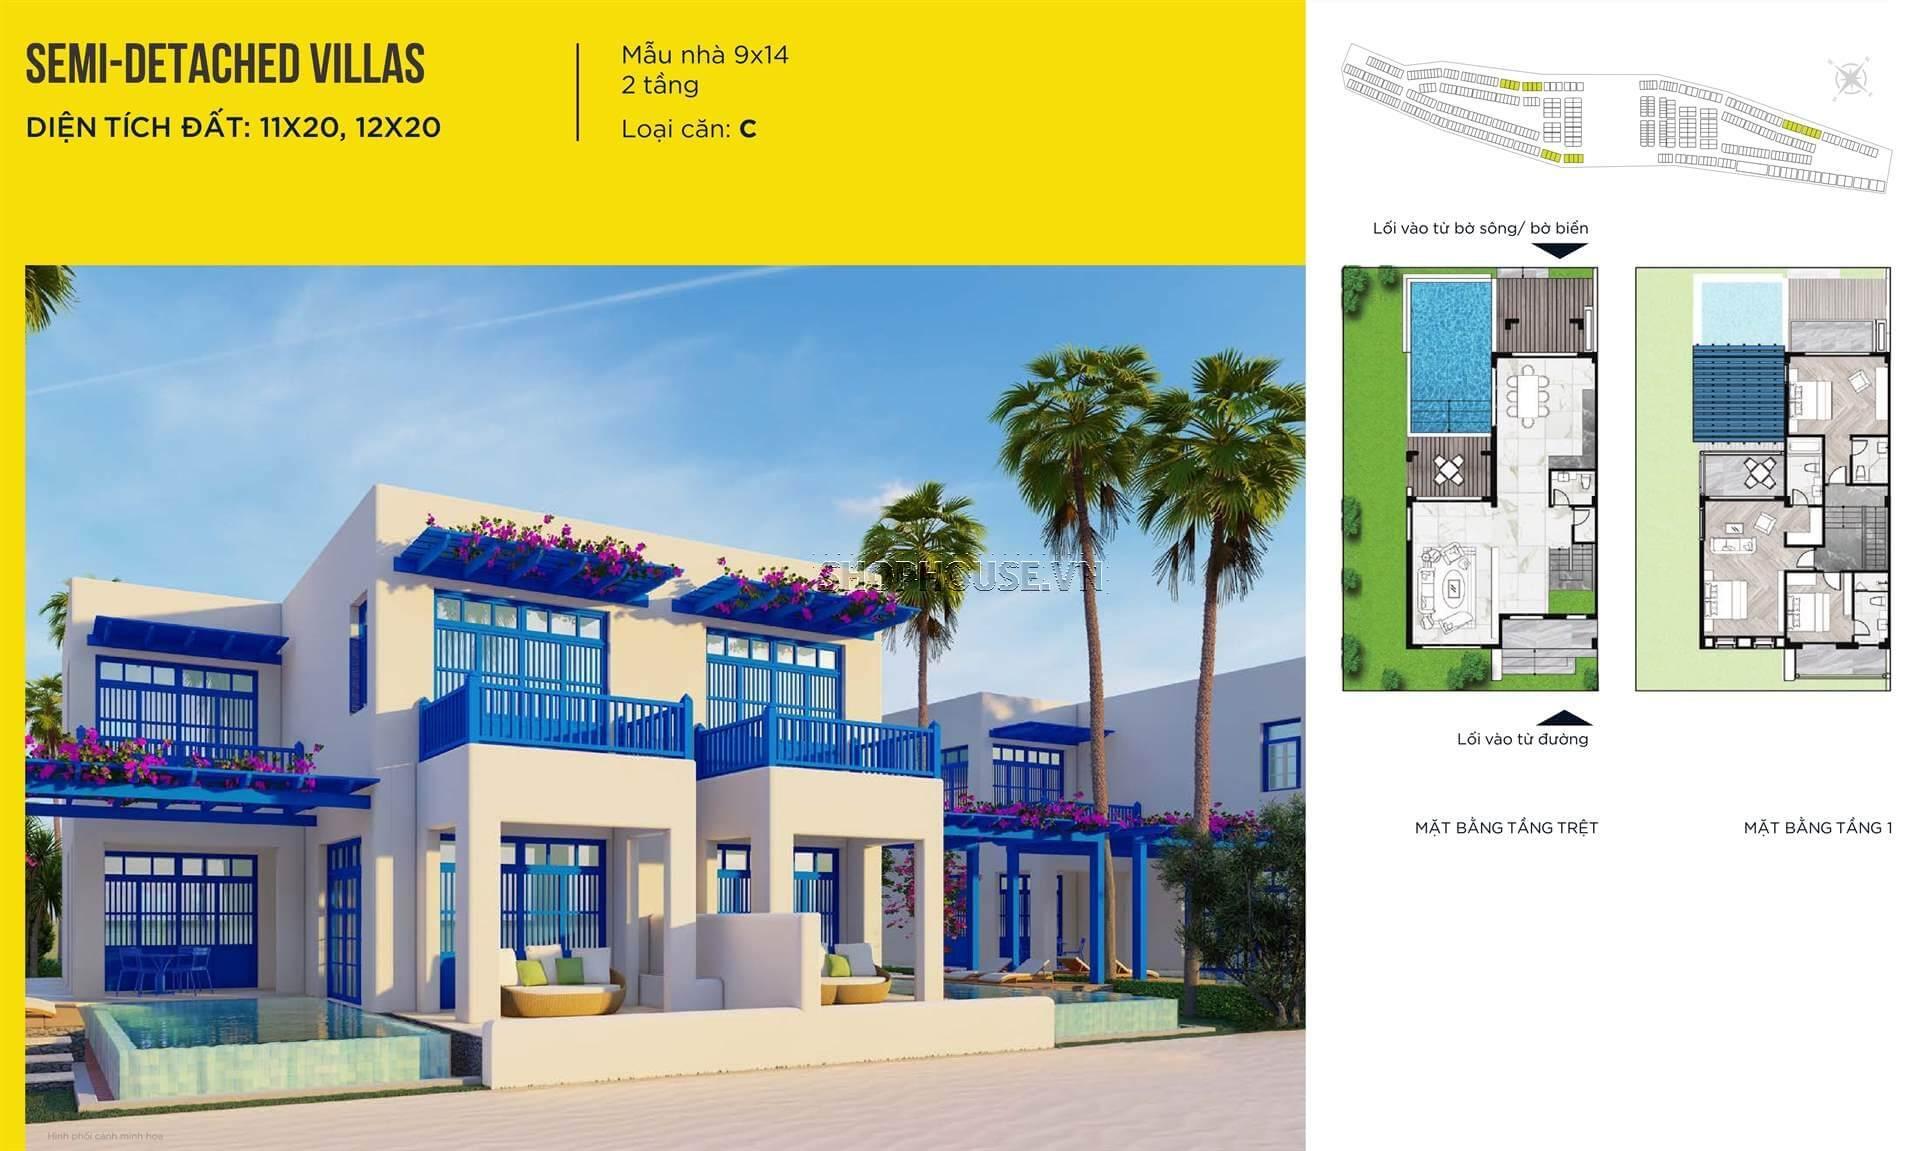 thiet-ke-biet-thu-song-lap-semi-detached-villas-Habana-Island-dien-tich-11x20-12x20-can-C